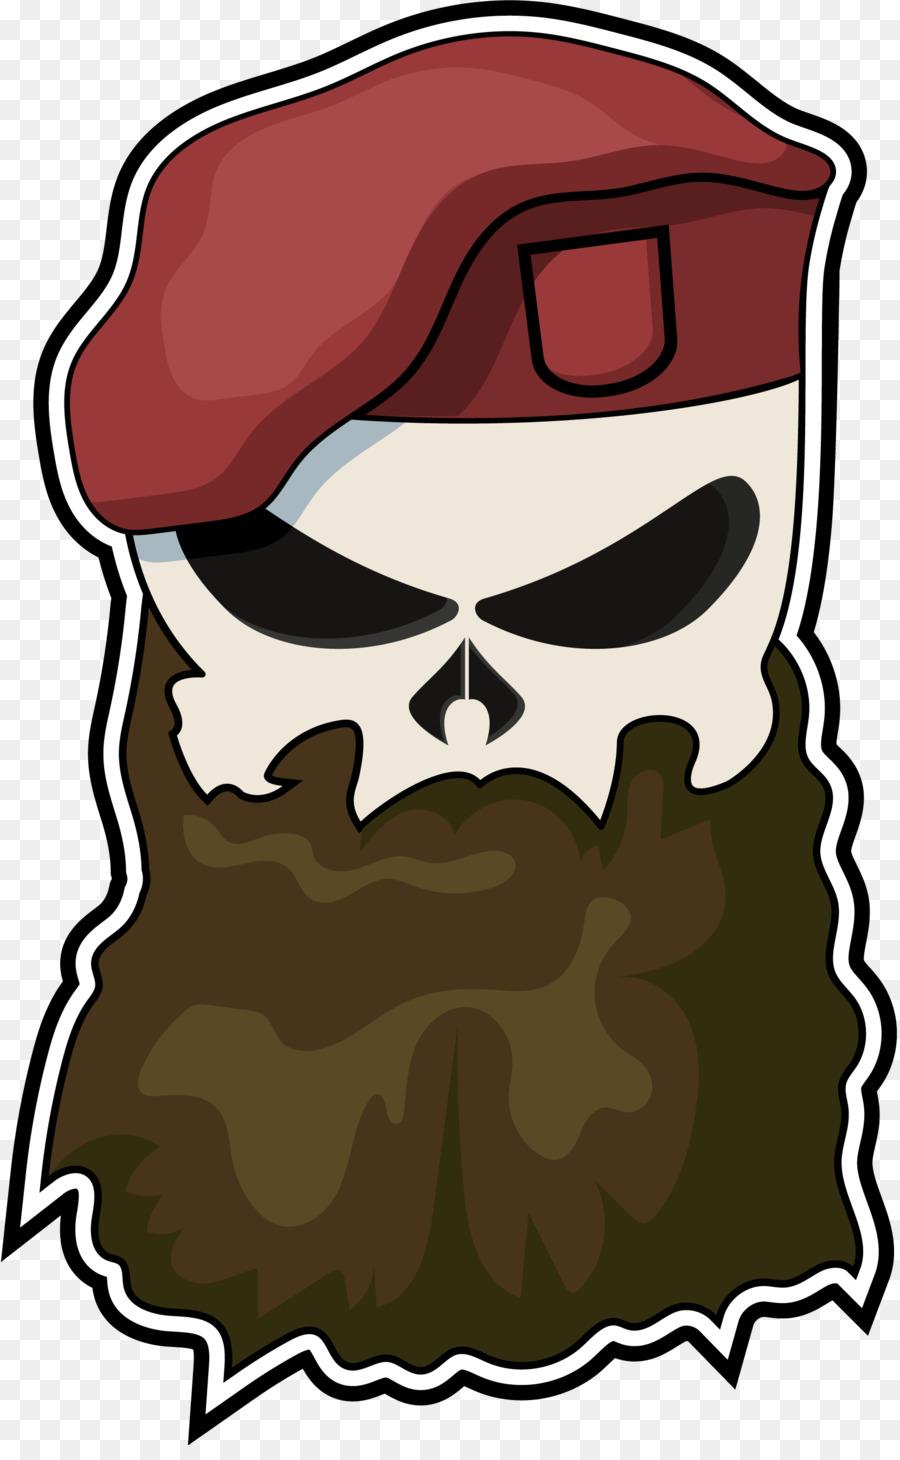 Decal sticker beard visual arts head png